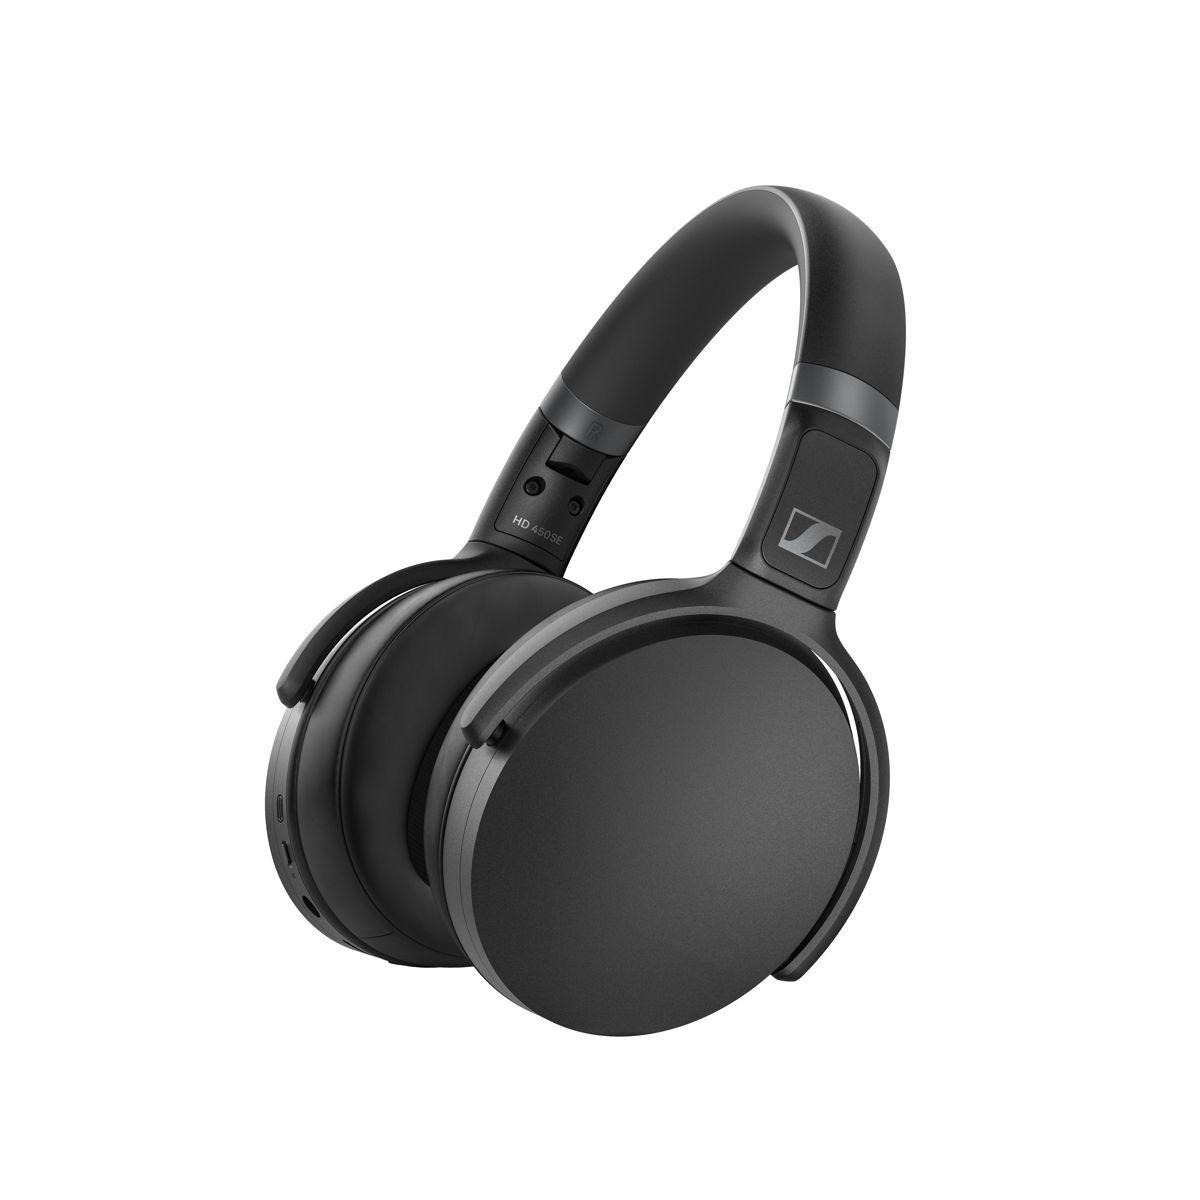 Sennheisers HD 450SE bietet nahtlose Sprachassistenz, inklusive Amazon Alexa